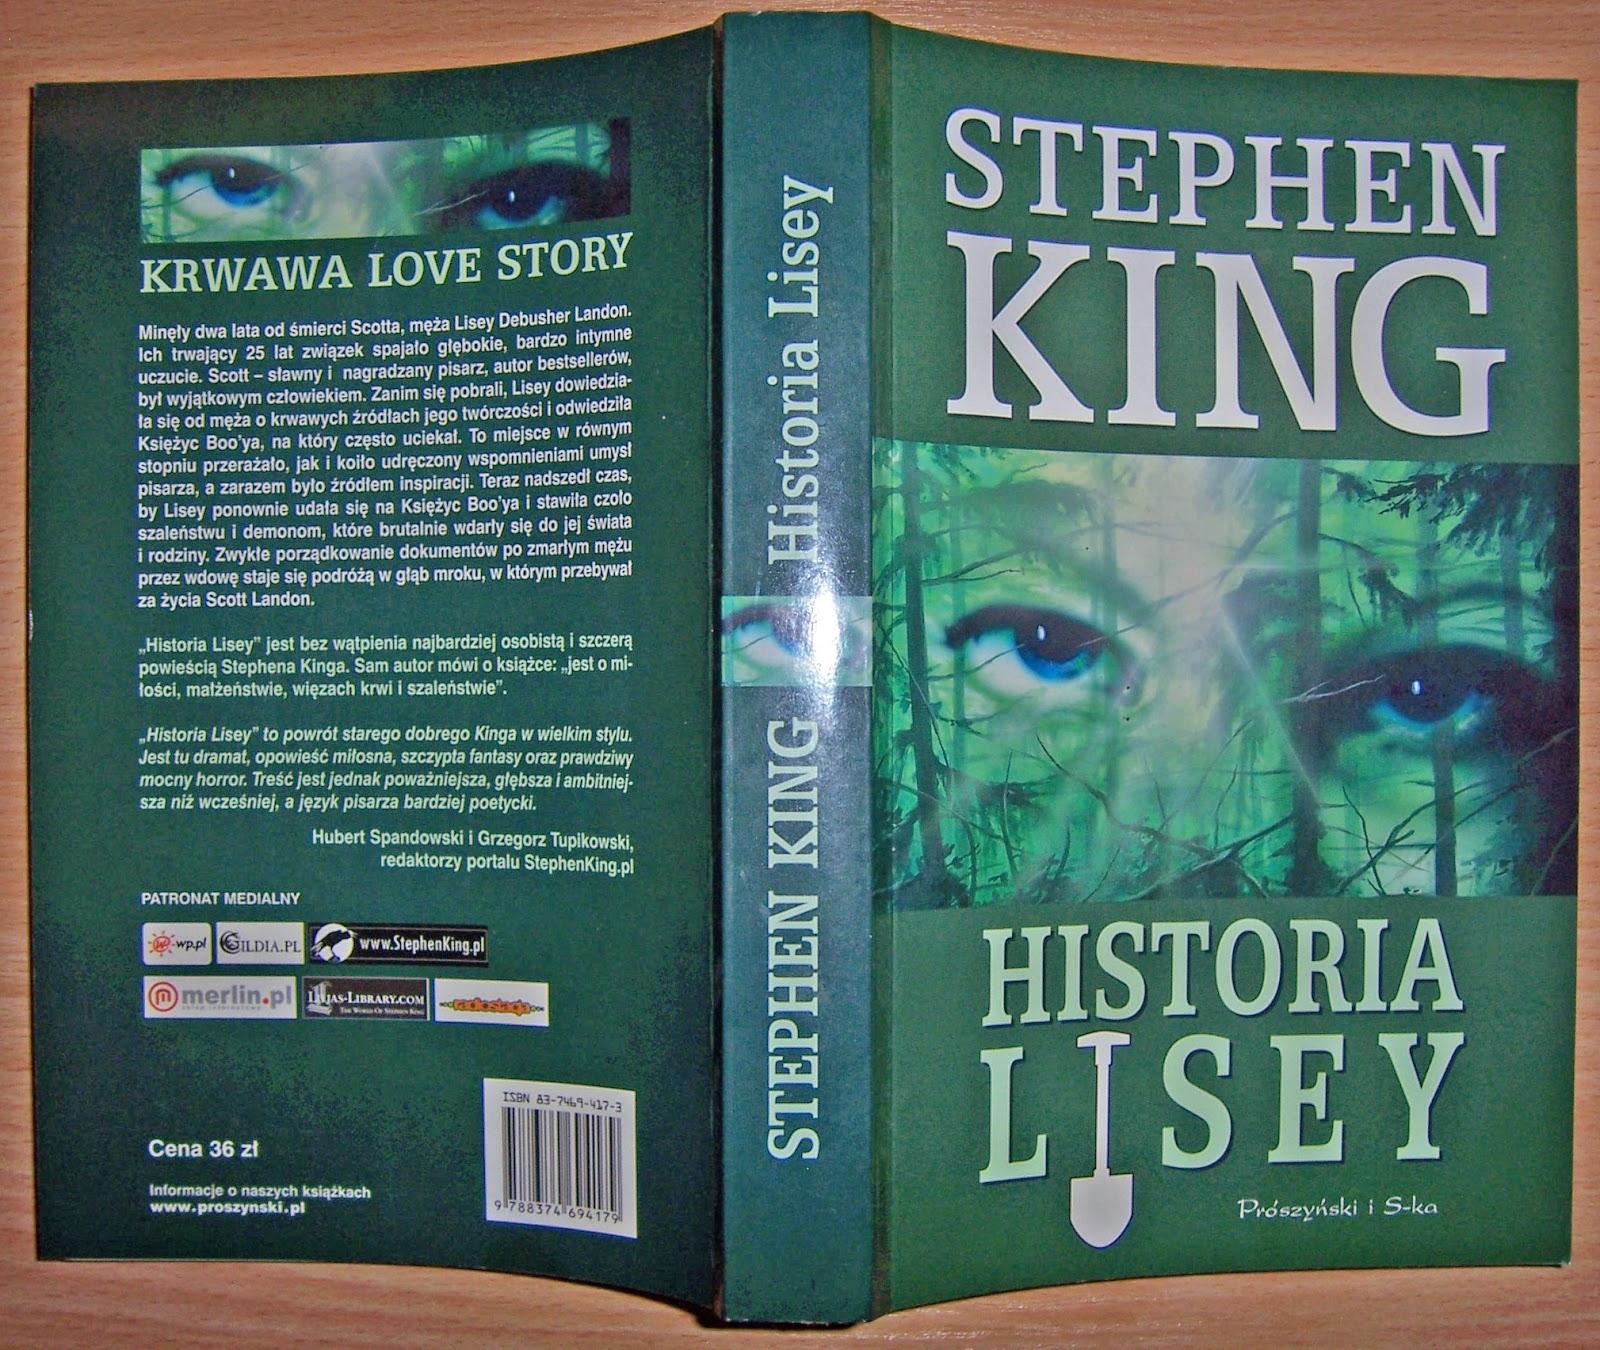 HISTORIA LISEY EPUB